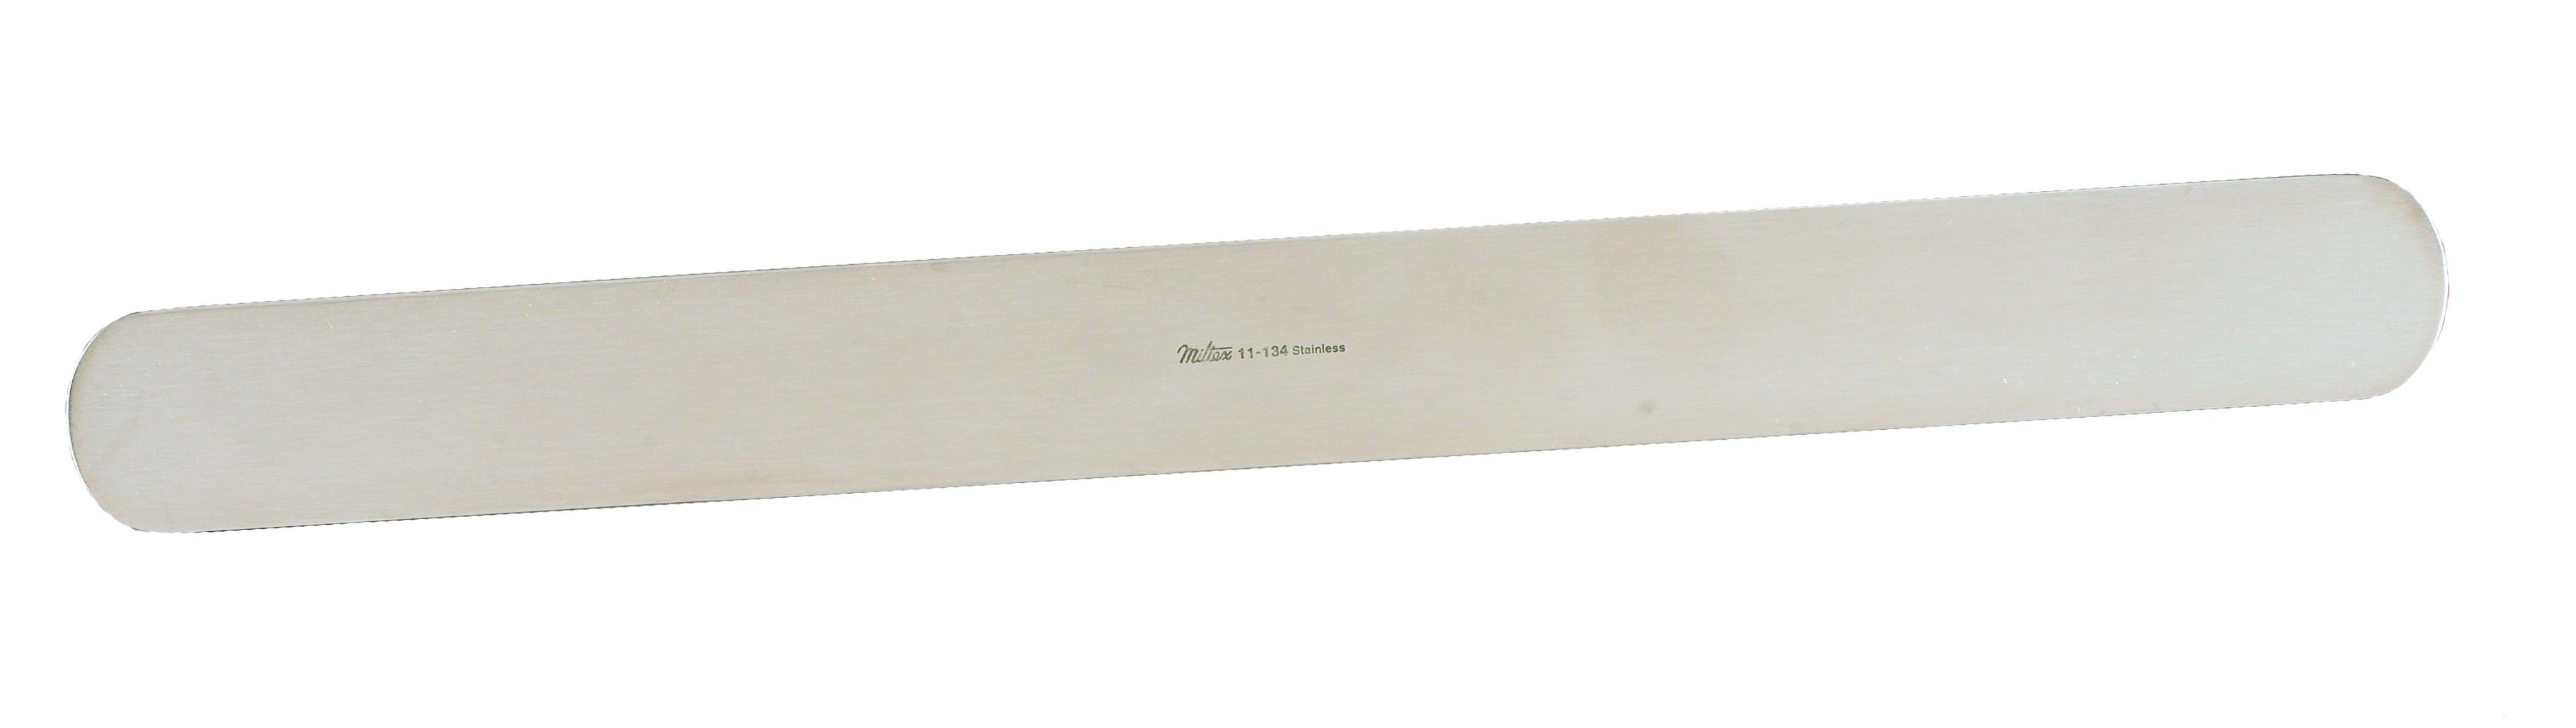 ribbon-retractor-1-1-4-32-cm-x-13-33-cm-malleable-11-134-miltex.jpg